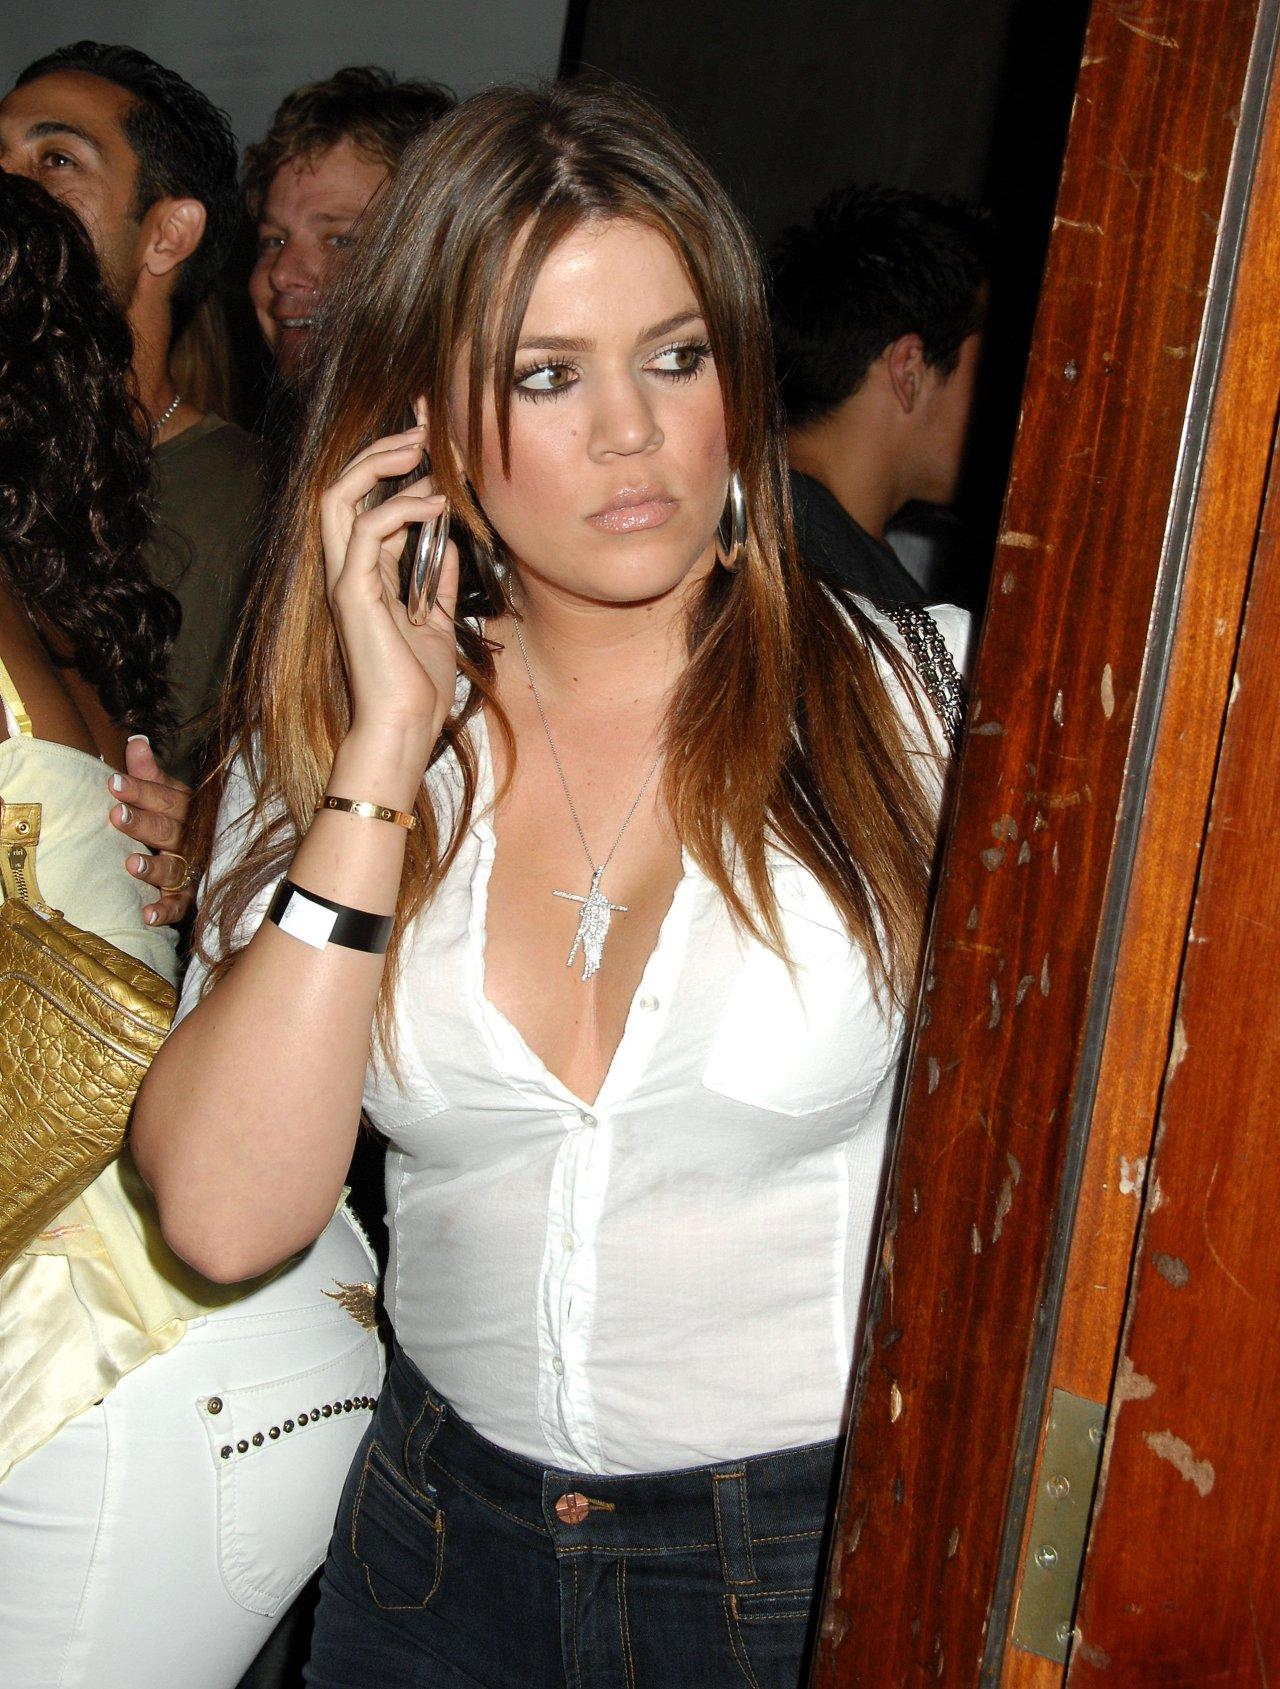 Khloe Kardashian Pictures 94